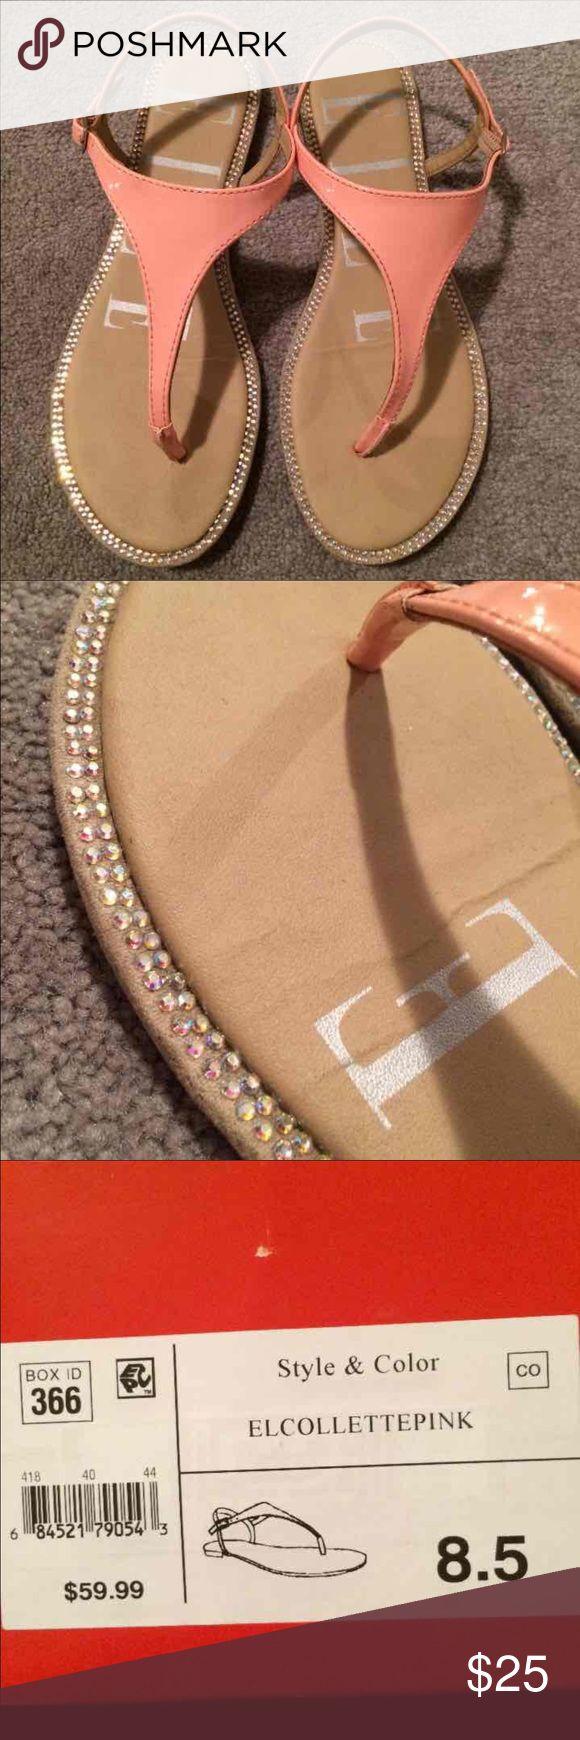 ❤SALE❤ 1 HOUR!! Coral Elle Sandals Gently used Gorgeous Sandals! Size 8.5 Elle Shoes Sandals